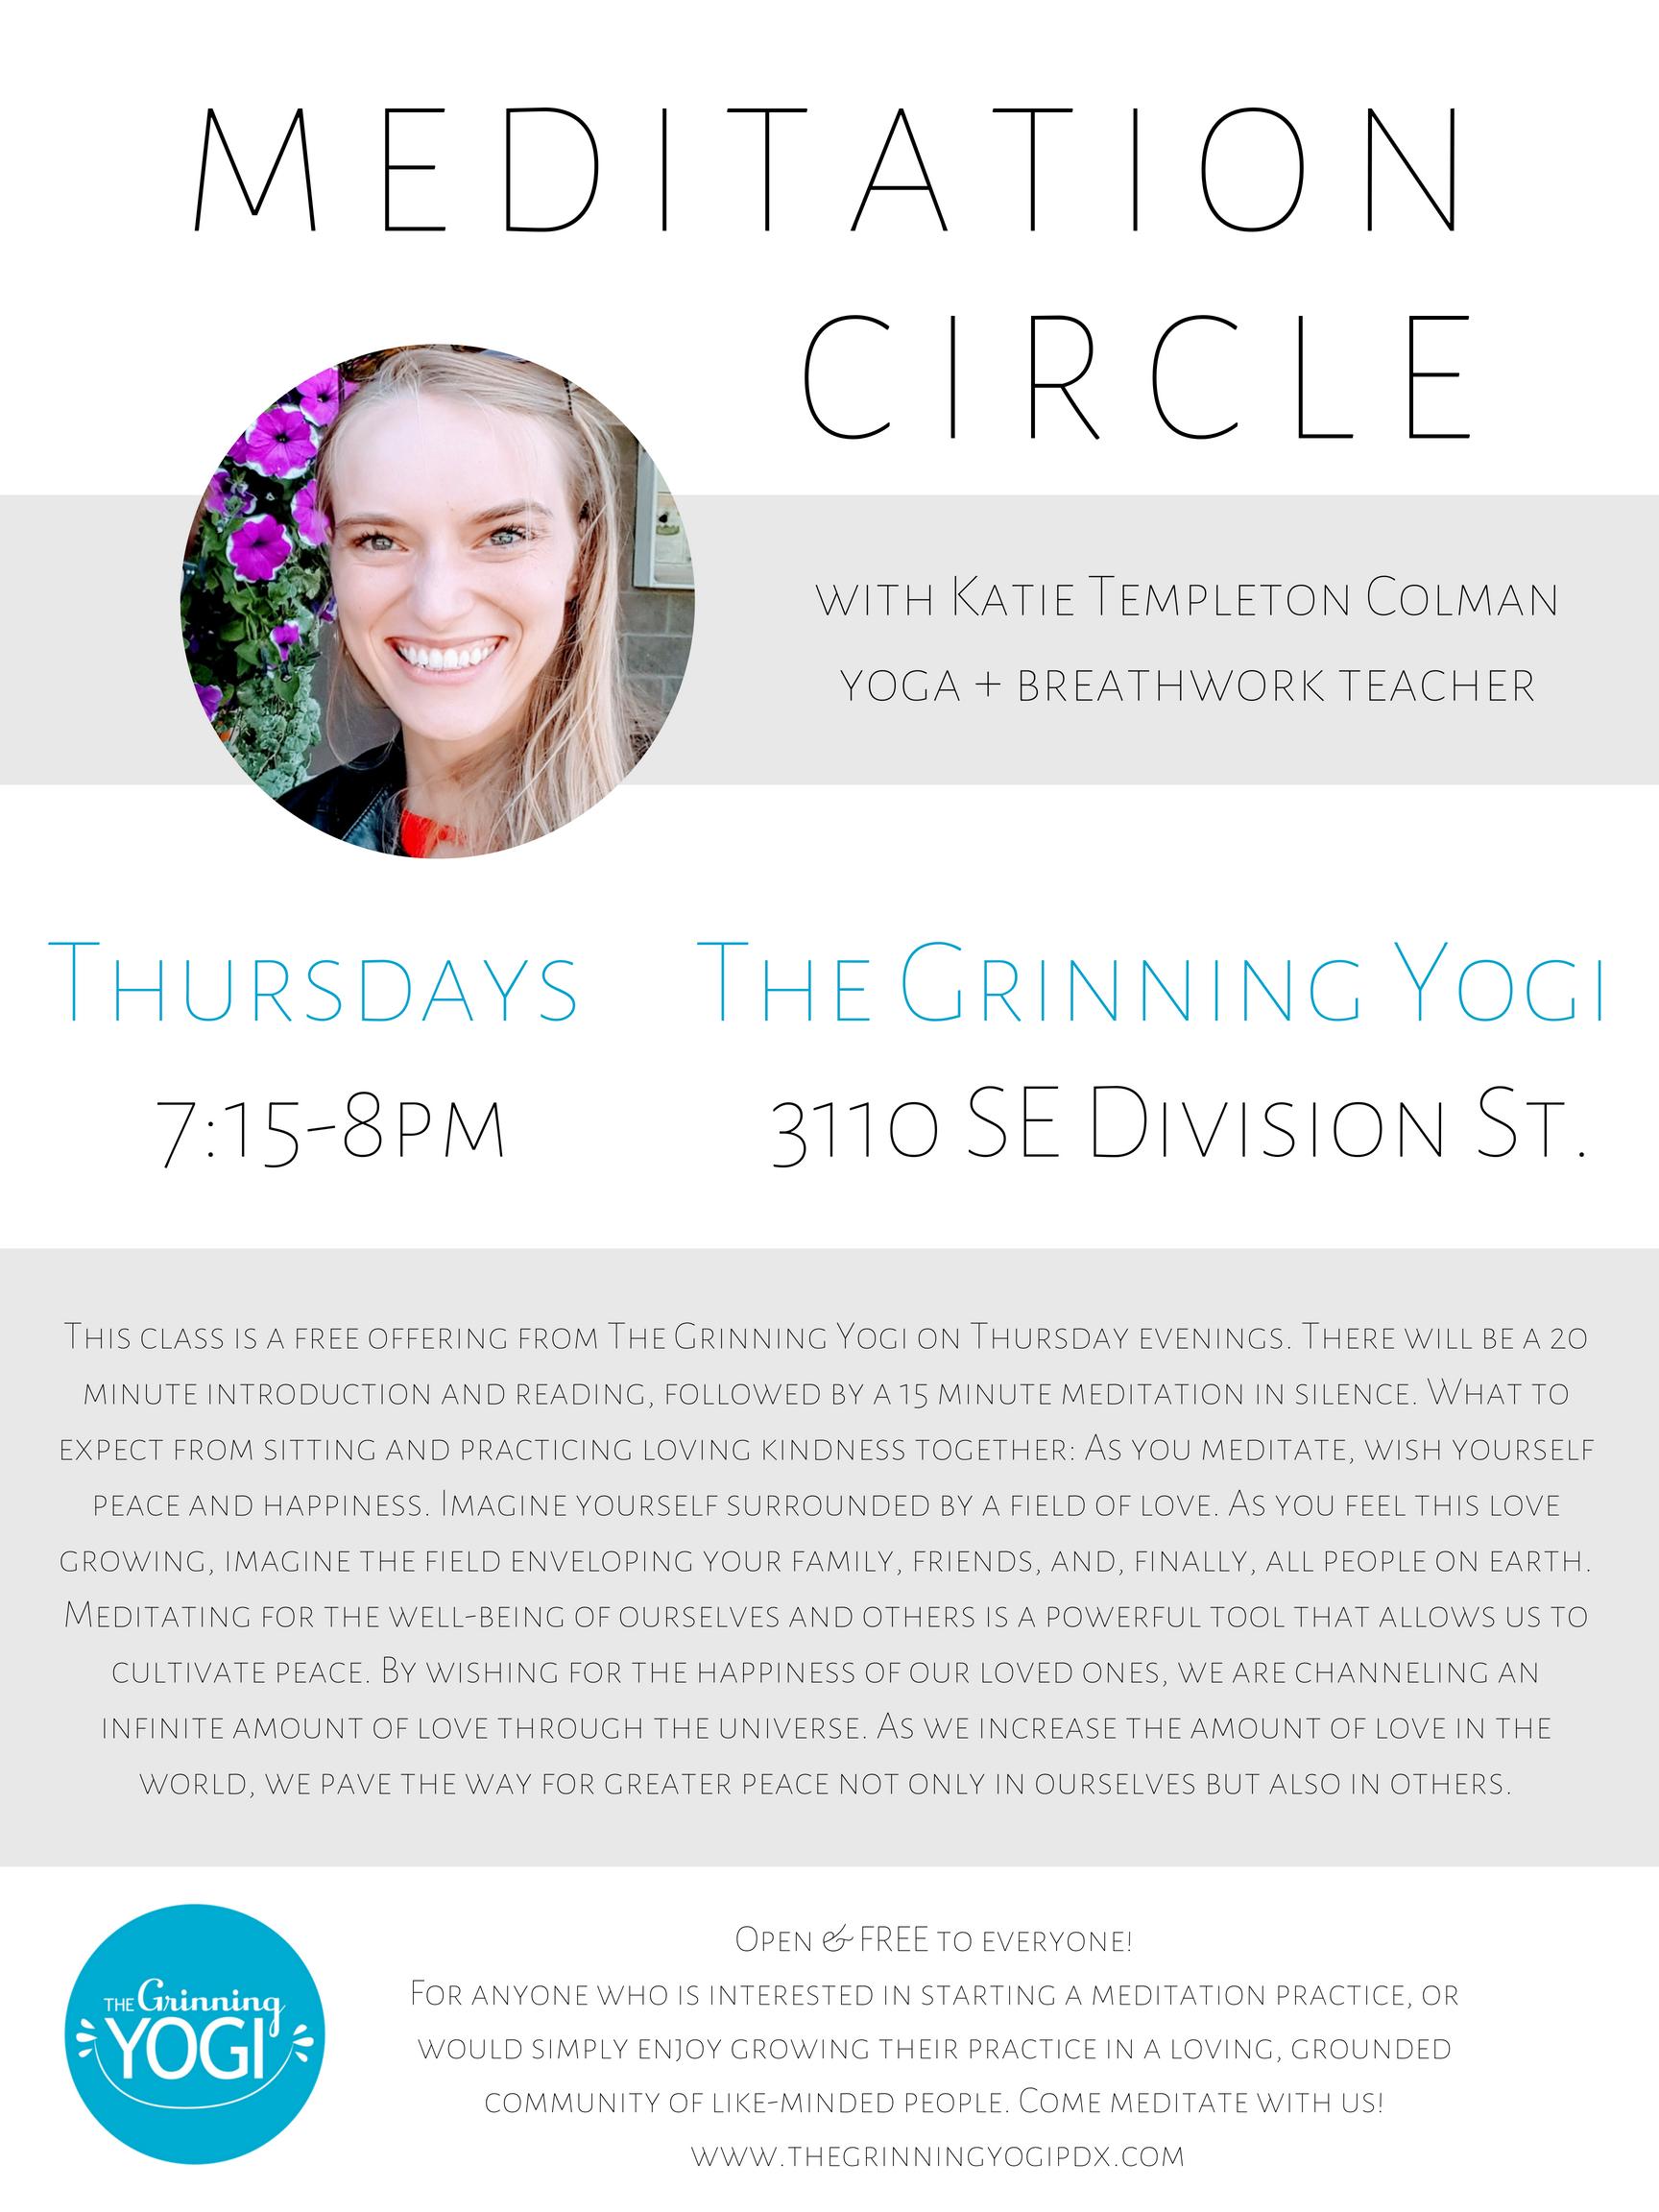 Meditation Circle The Grinning Yogi.jpg